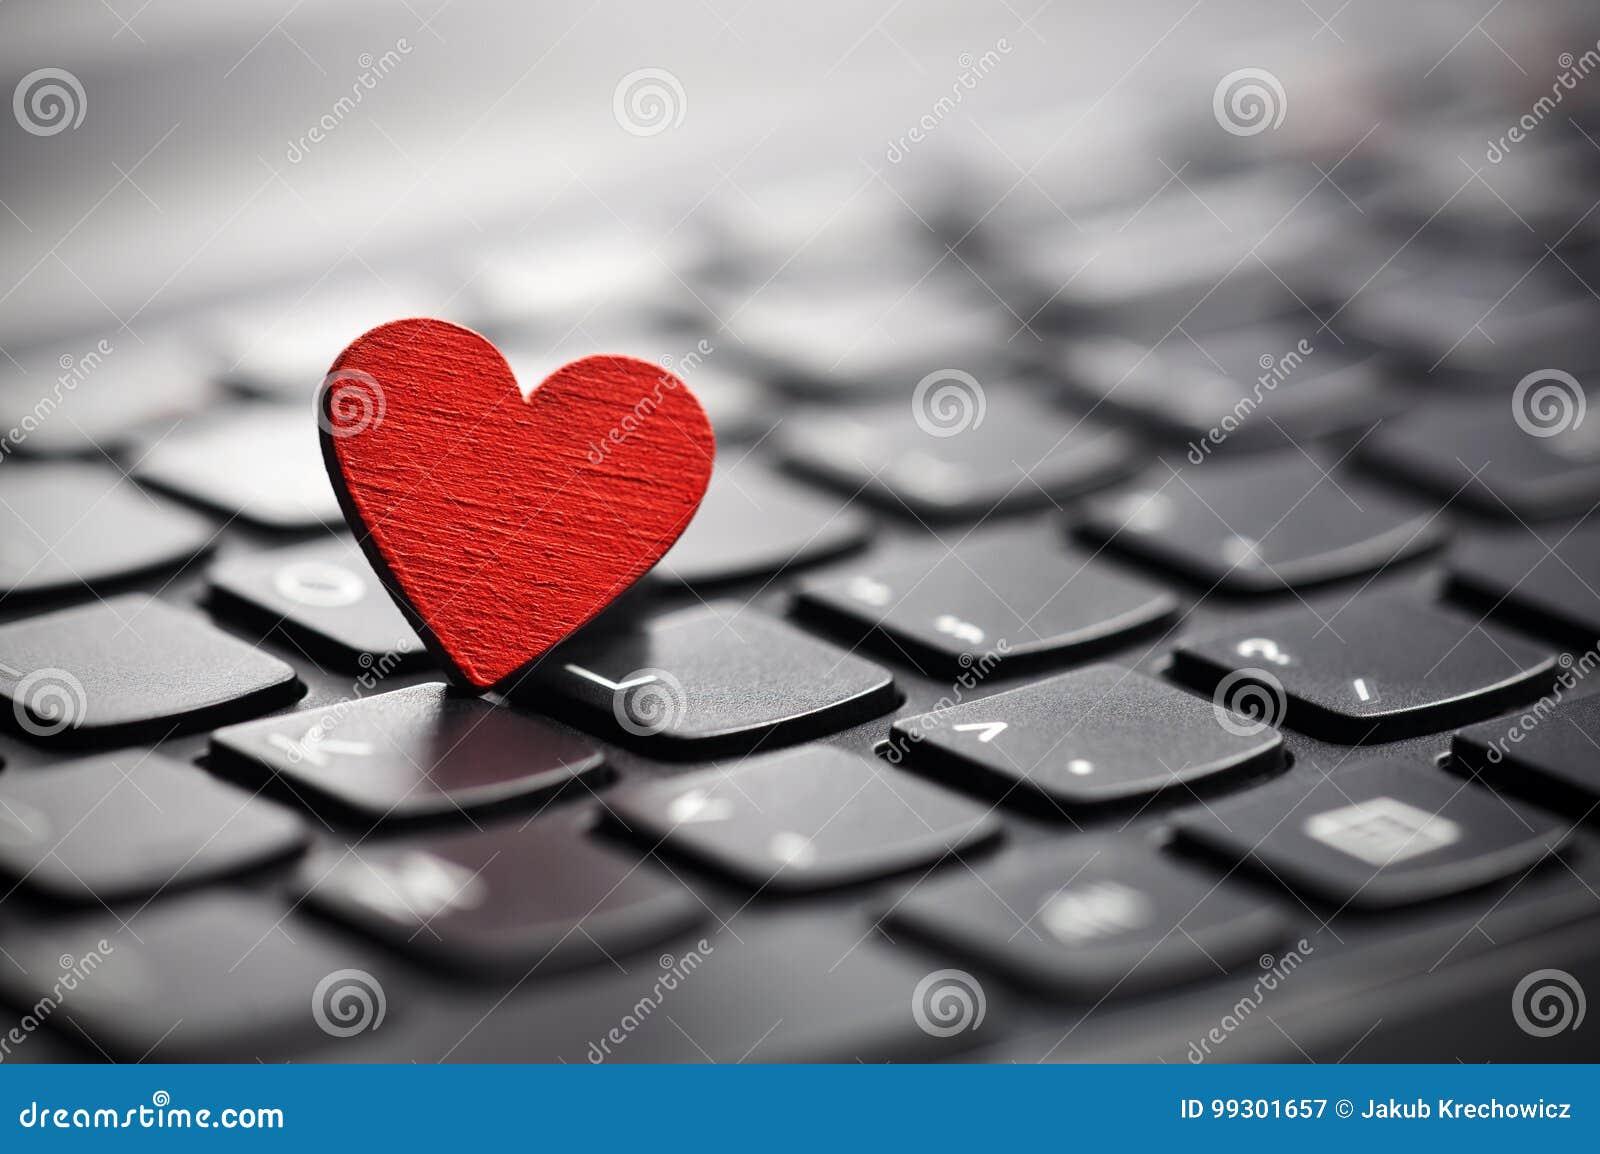 Tastatur symbol herz